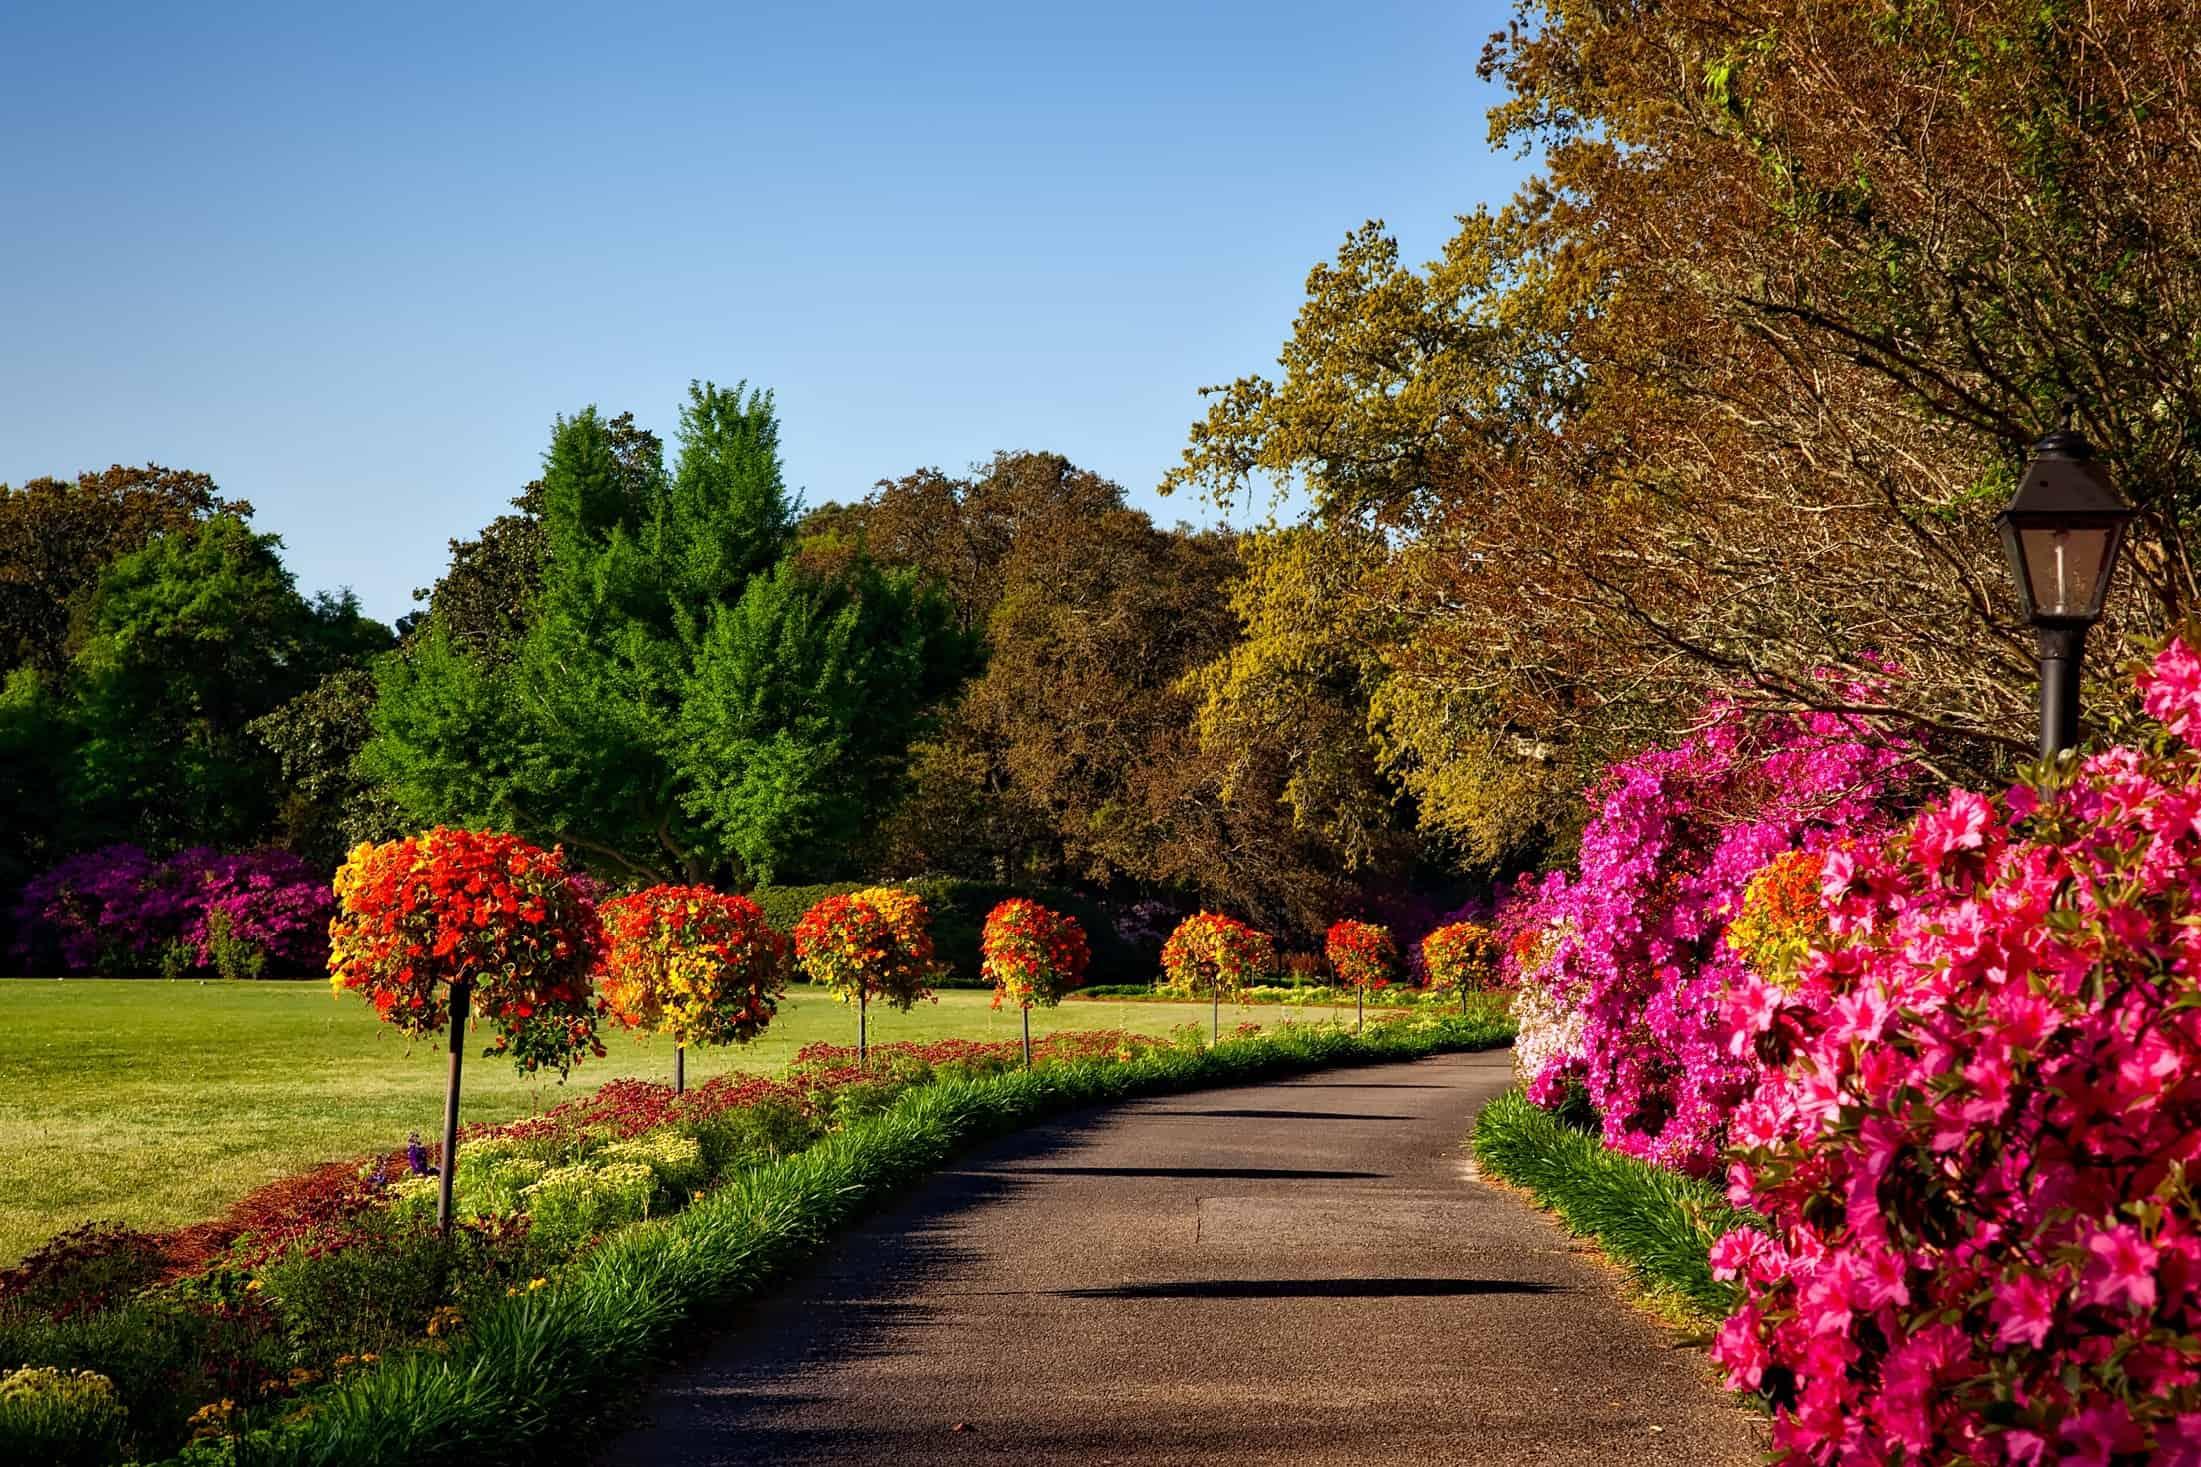 Custom LawnCare and Landscape Services